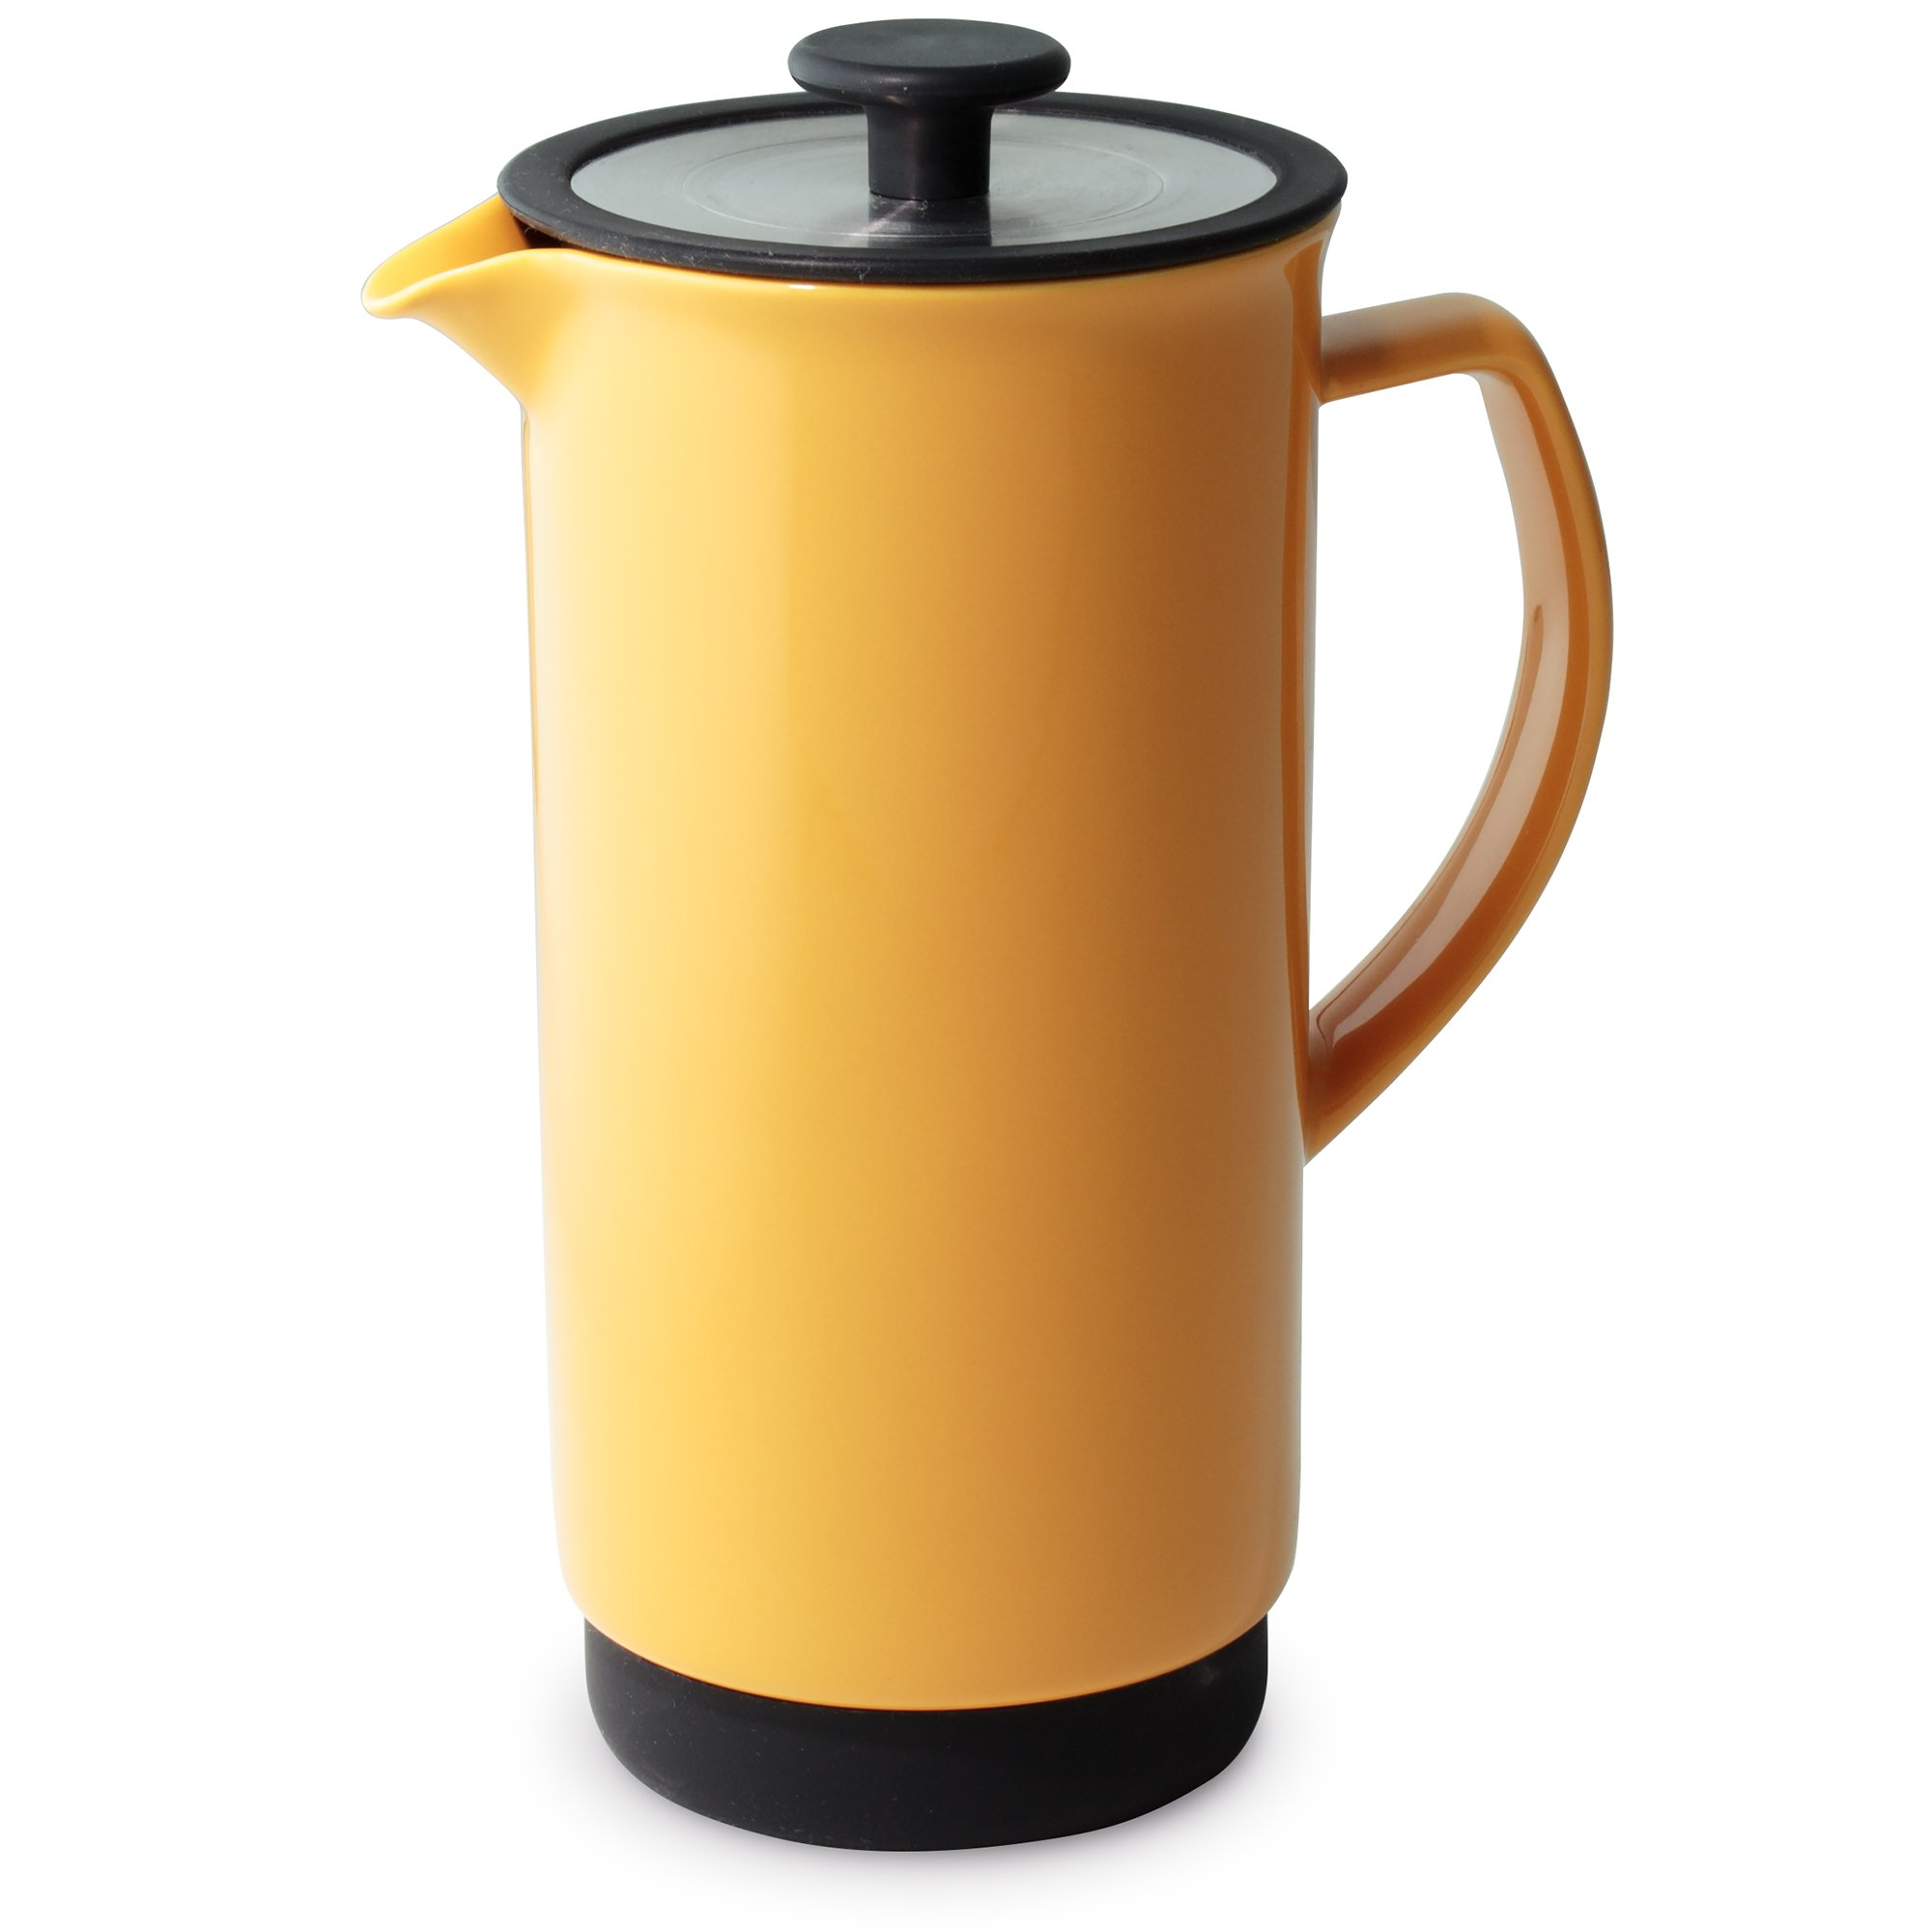 FORLIFE Cafe Style Coffee/Tea Press, 32-Ounce, Mandarin